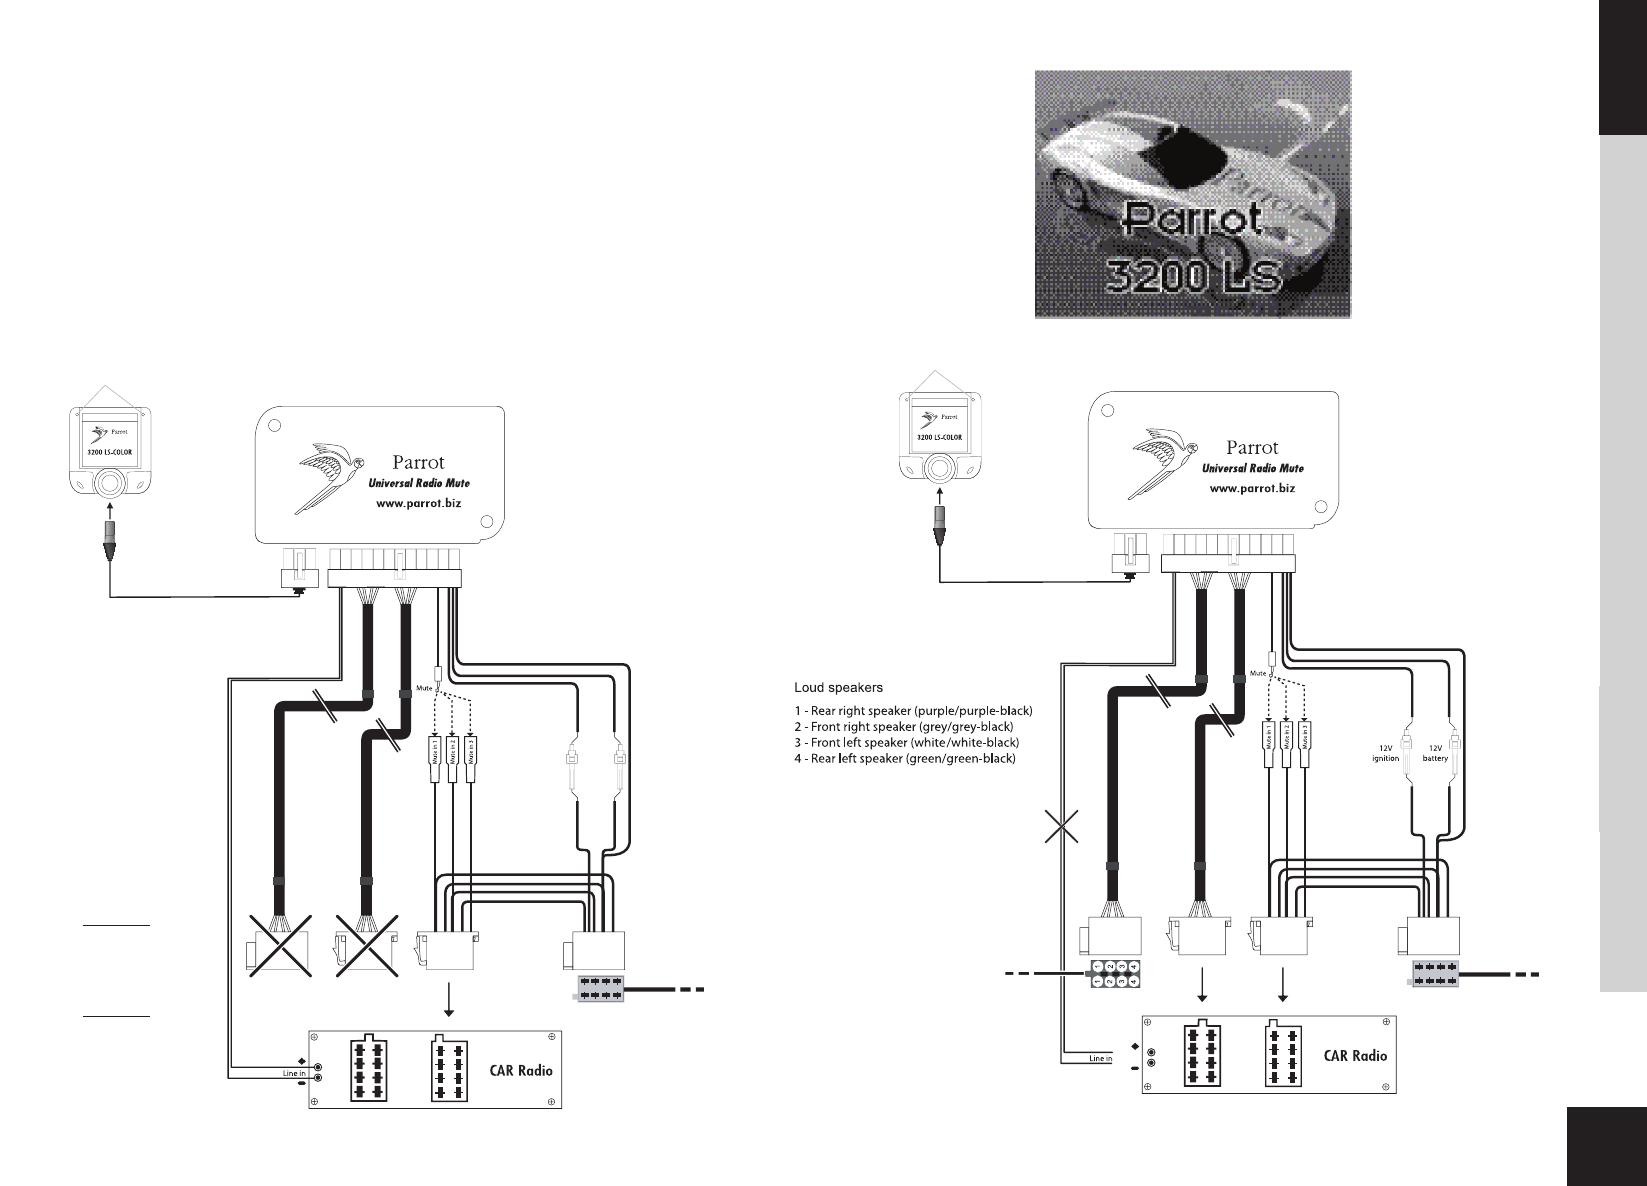 Parrot Bluetooth Wiring Diagram